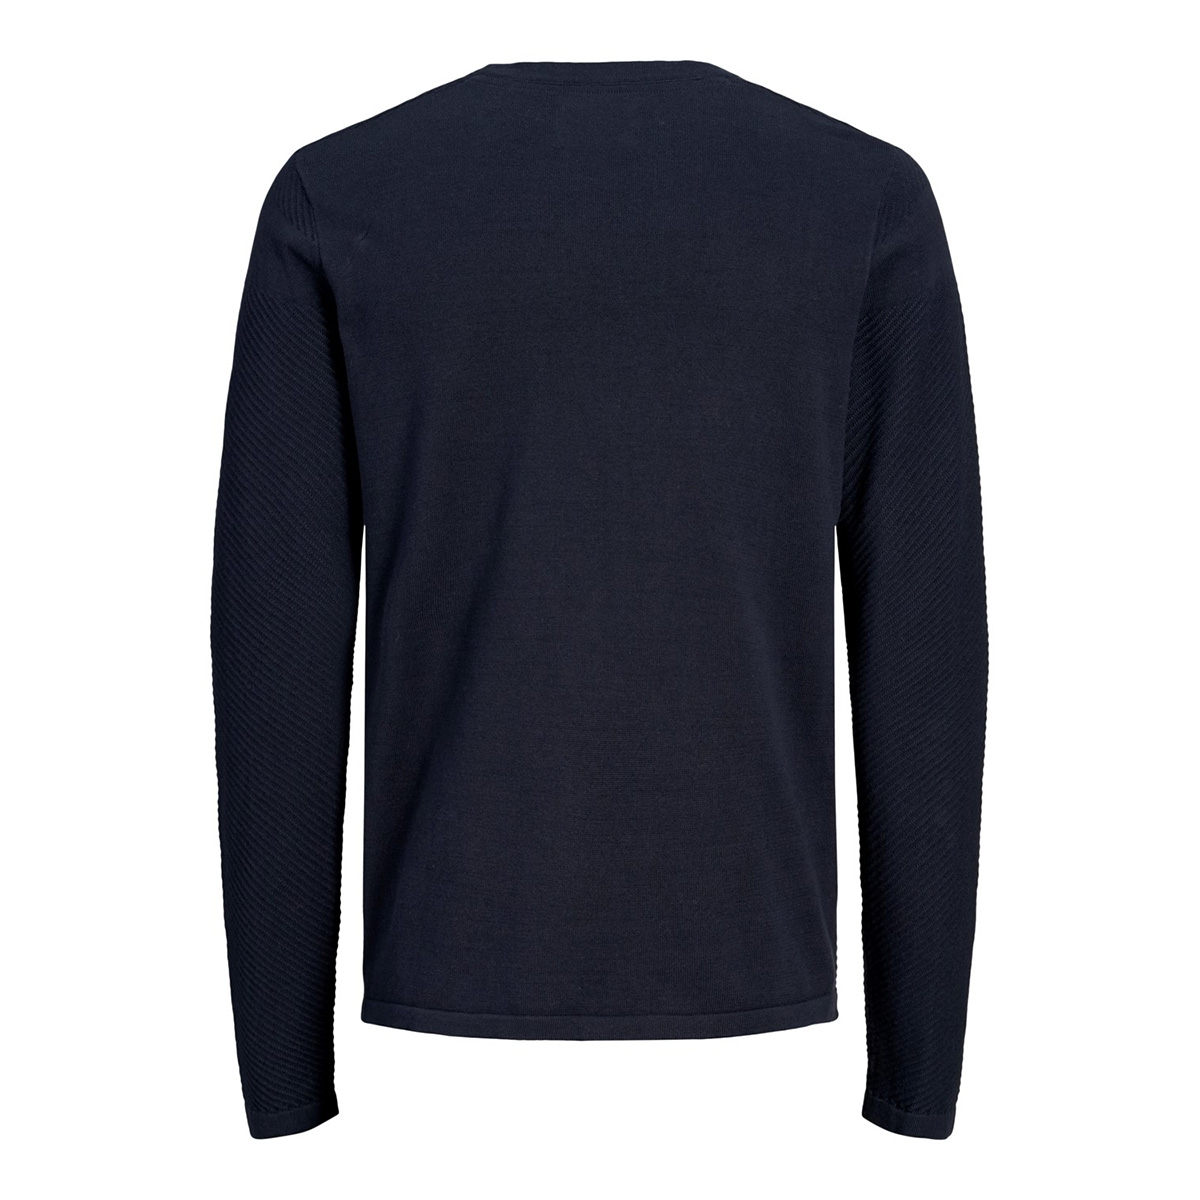 jcomoon knit crew neck 12163320 jack & jones trui sky captain/knit fit